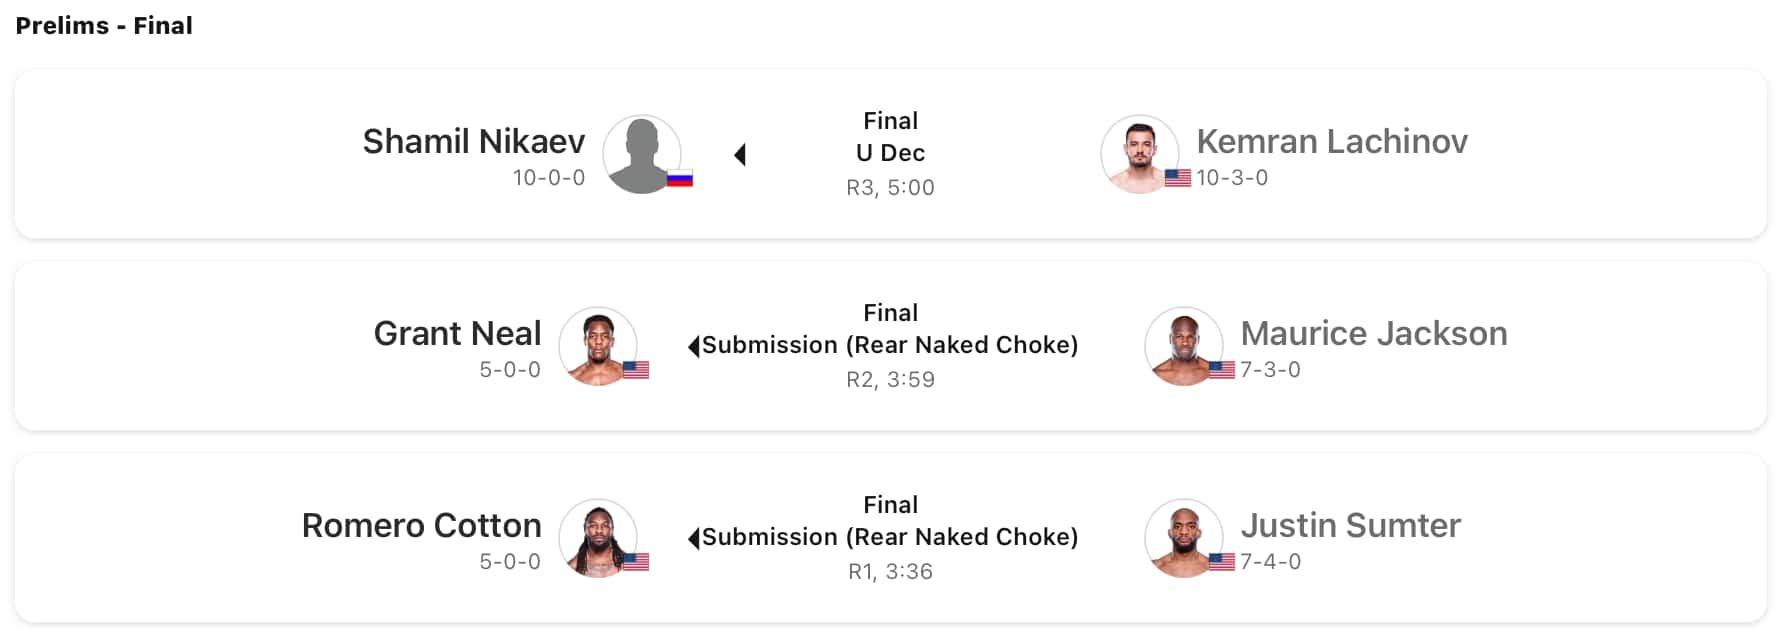 Bellator 254: Macfarlane vs. Velasquez